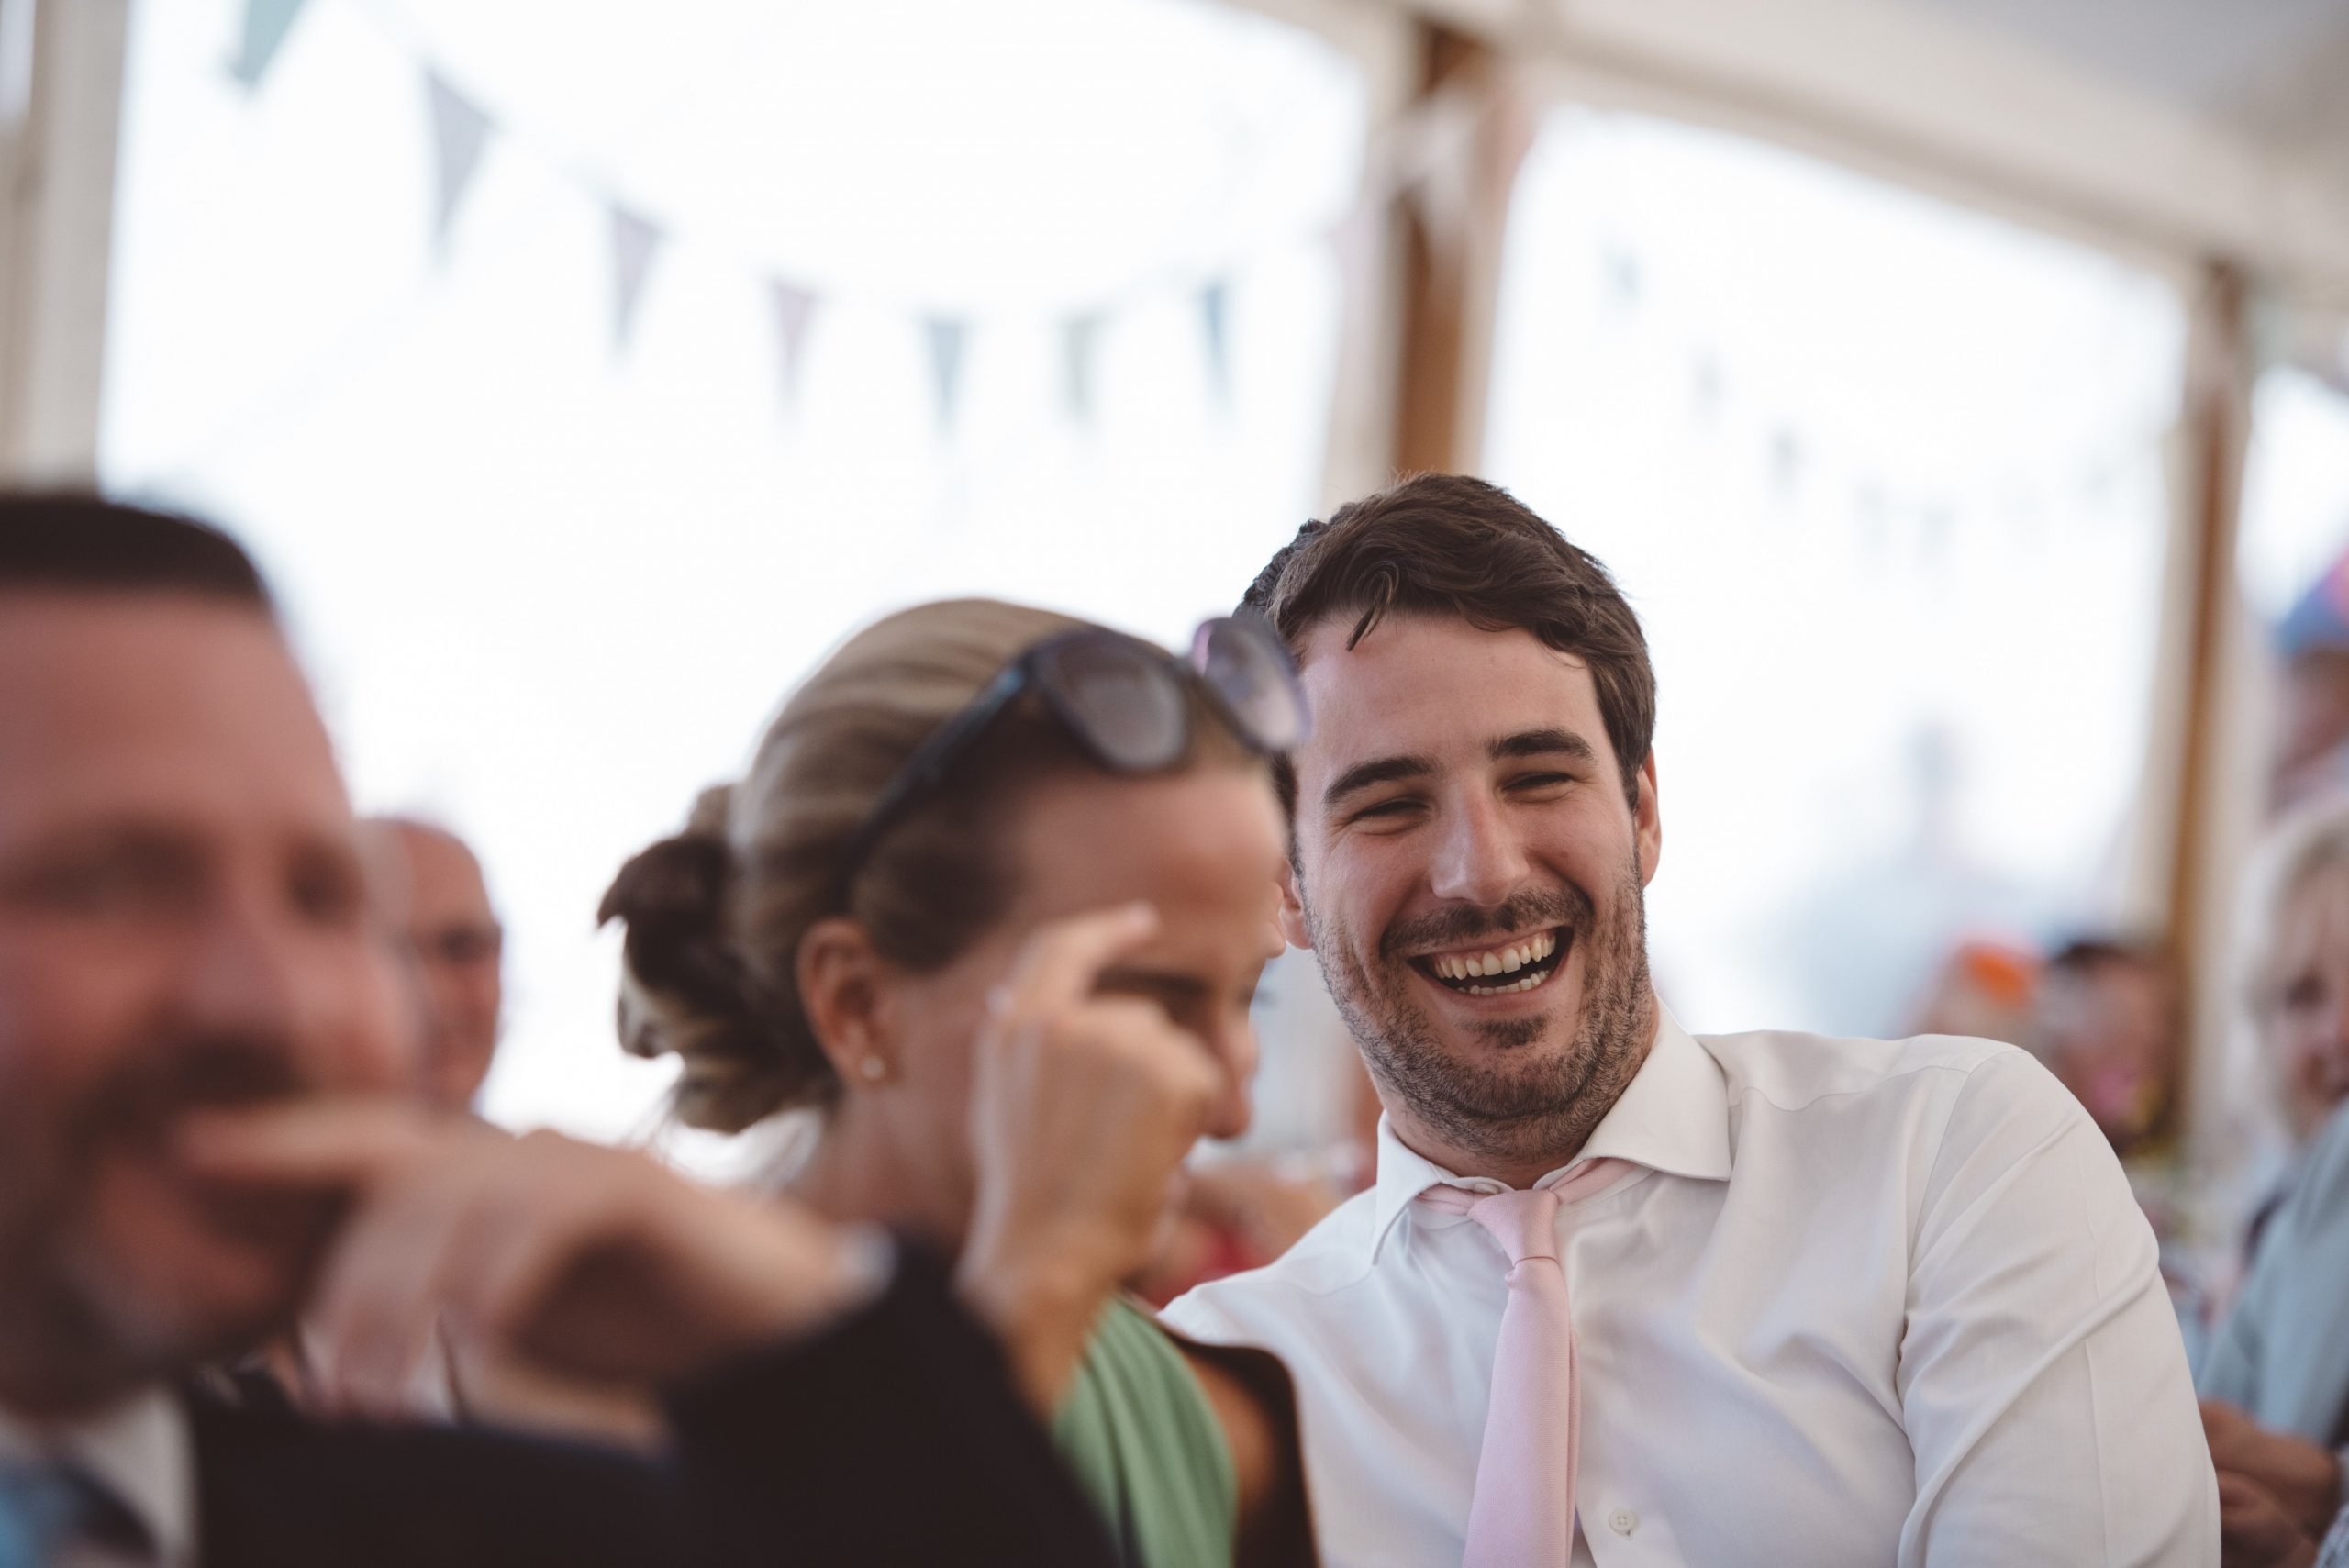 candid wedding speech photo at Carswell weddings